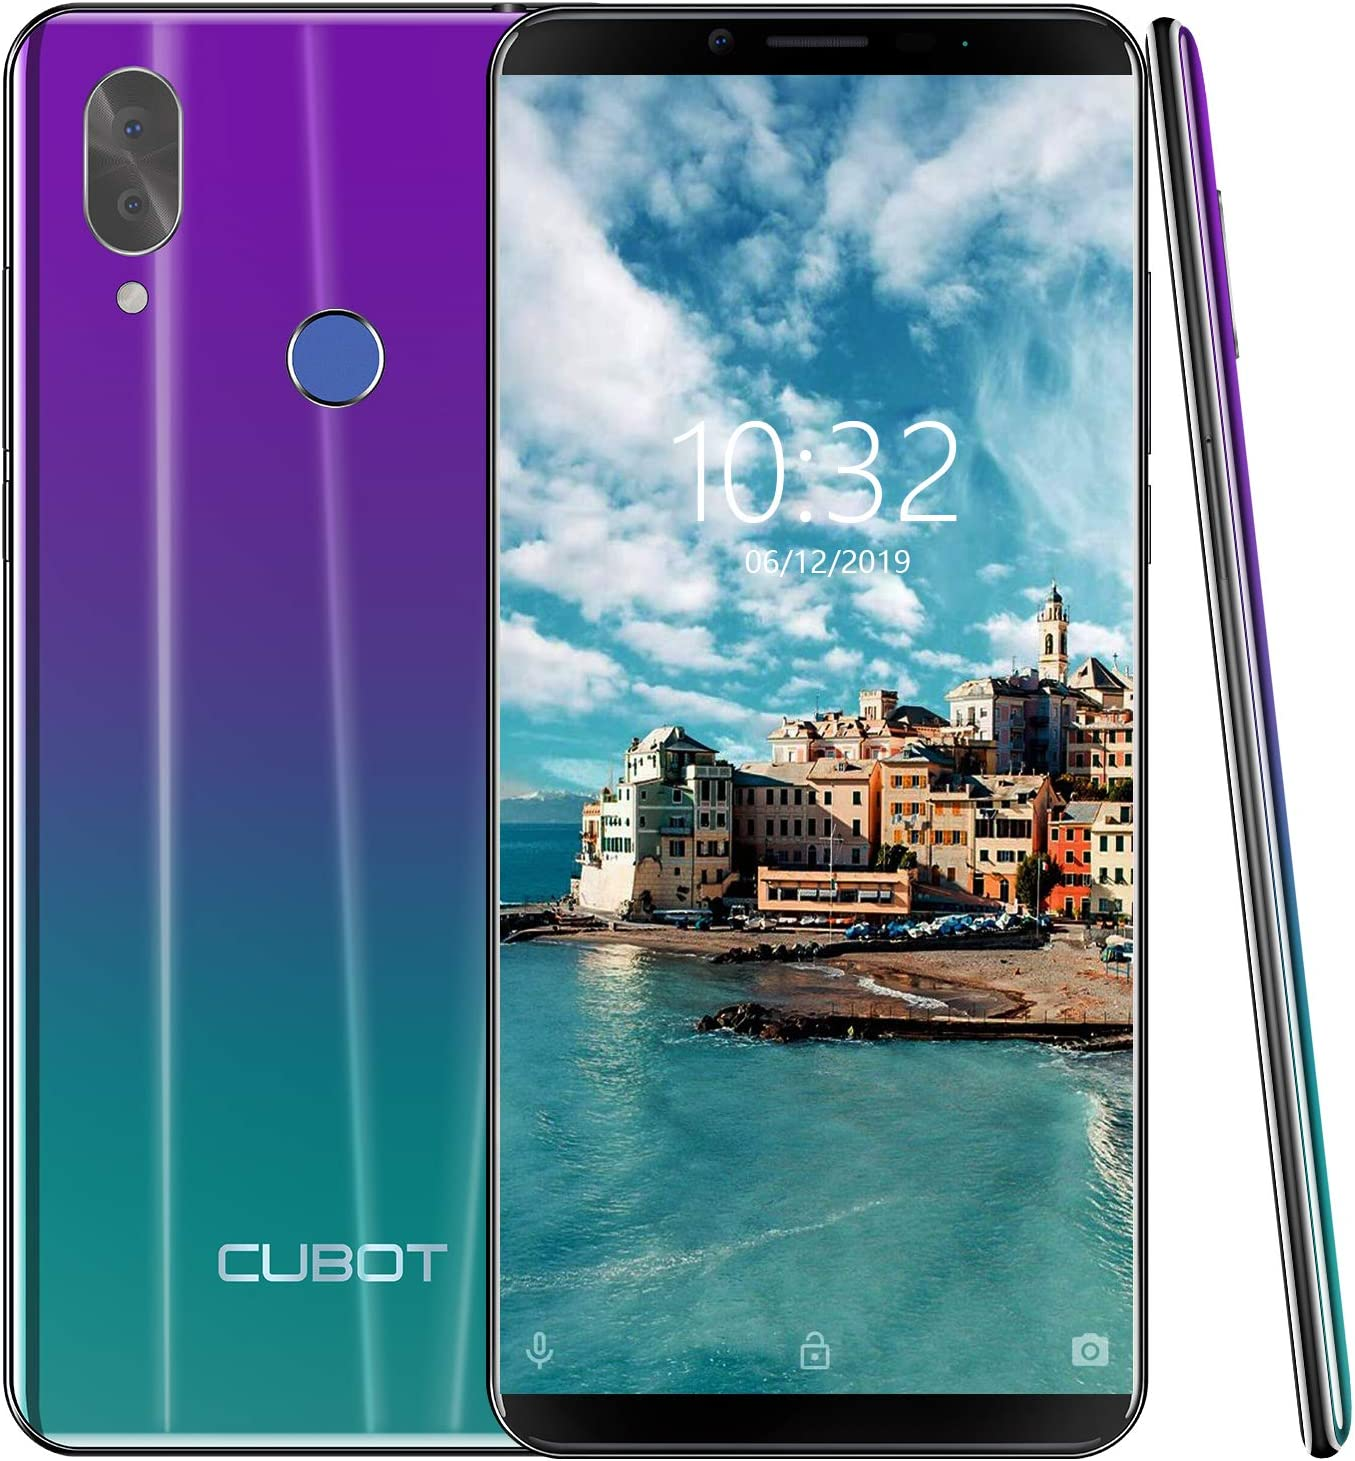 4G Unlocked Smartphone, CUBOT X19 Android 9.0 Phones Unlocked with 5.93 inch FHD Display, 4GB RAM+64GB ROM, 4000mAh Battery,16MP Camera, Fingerprint Sensor,Face ID-Twilight